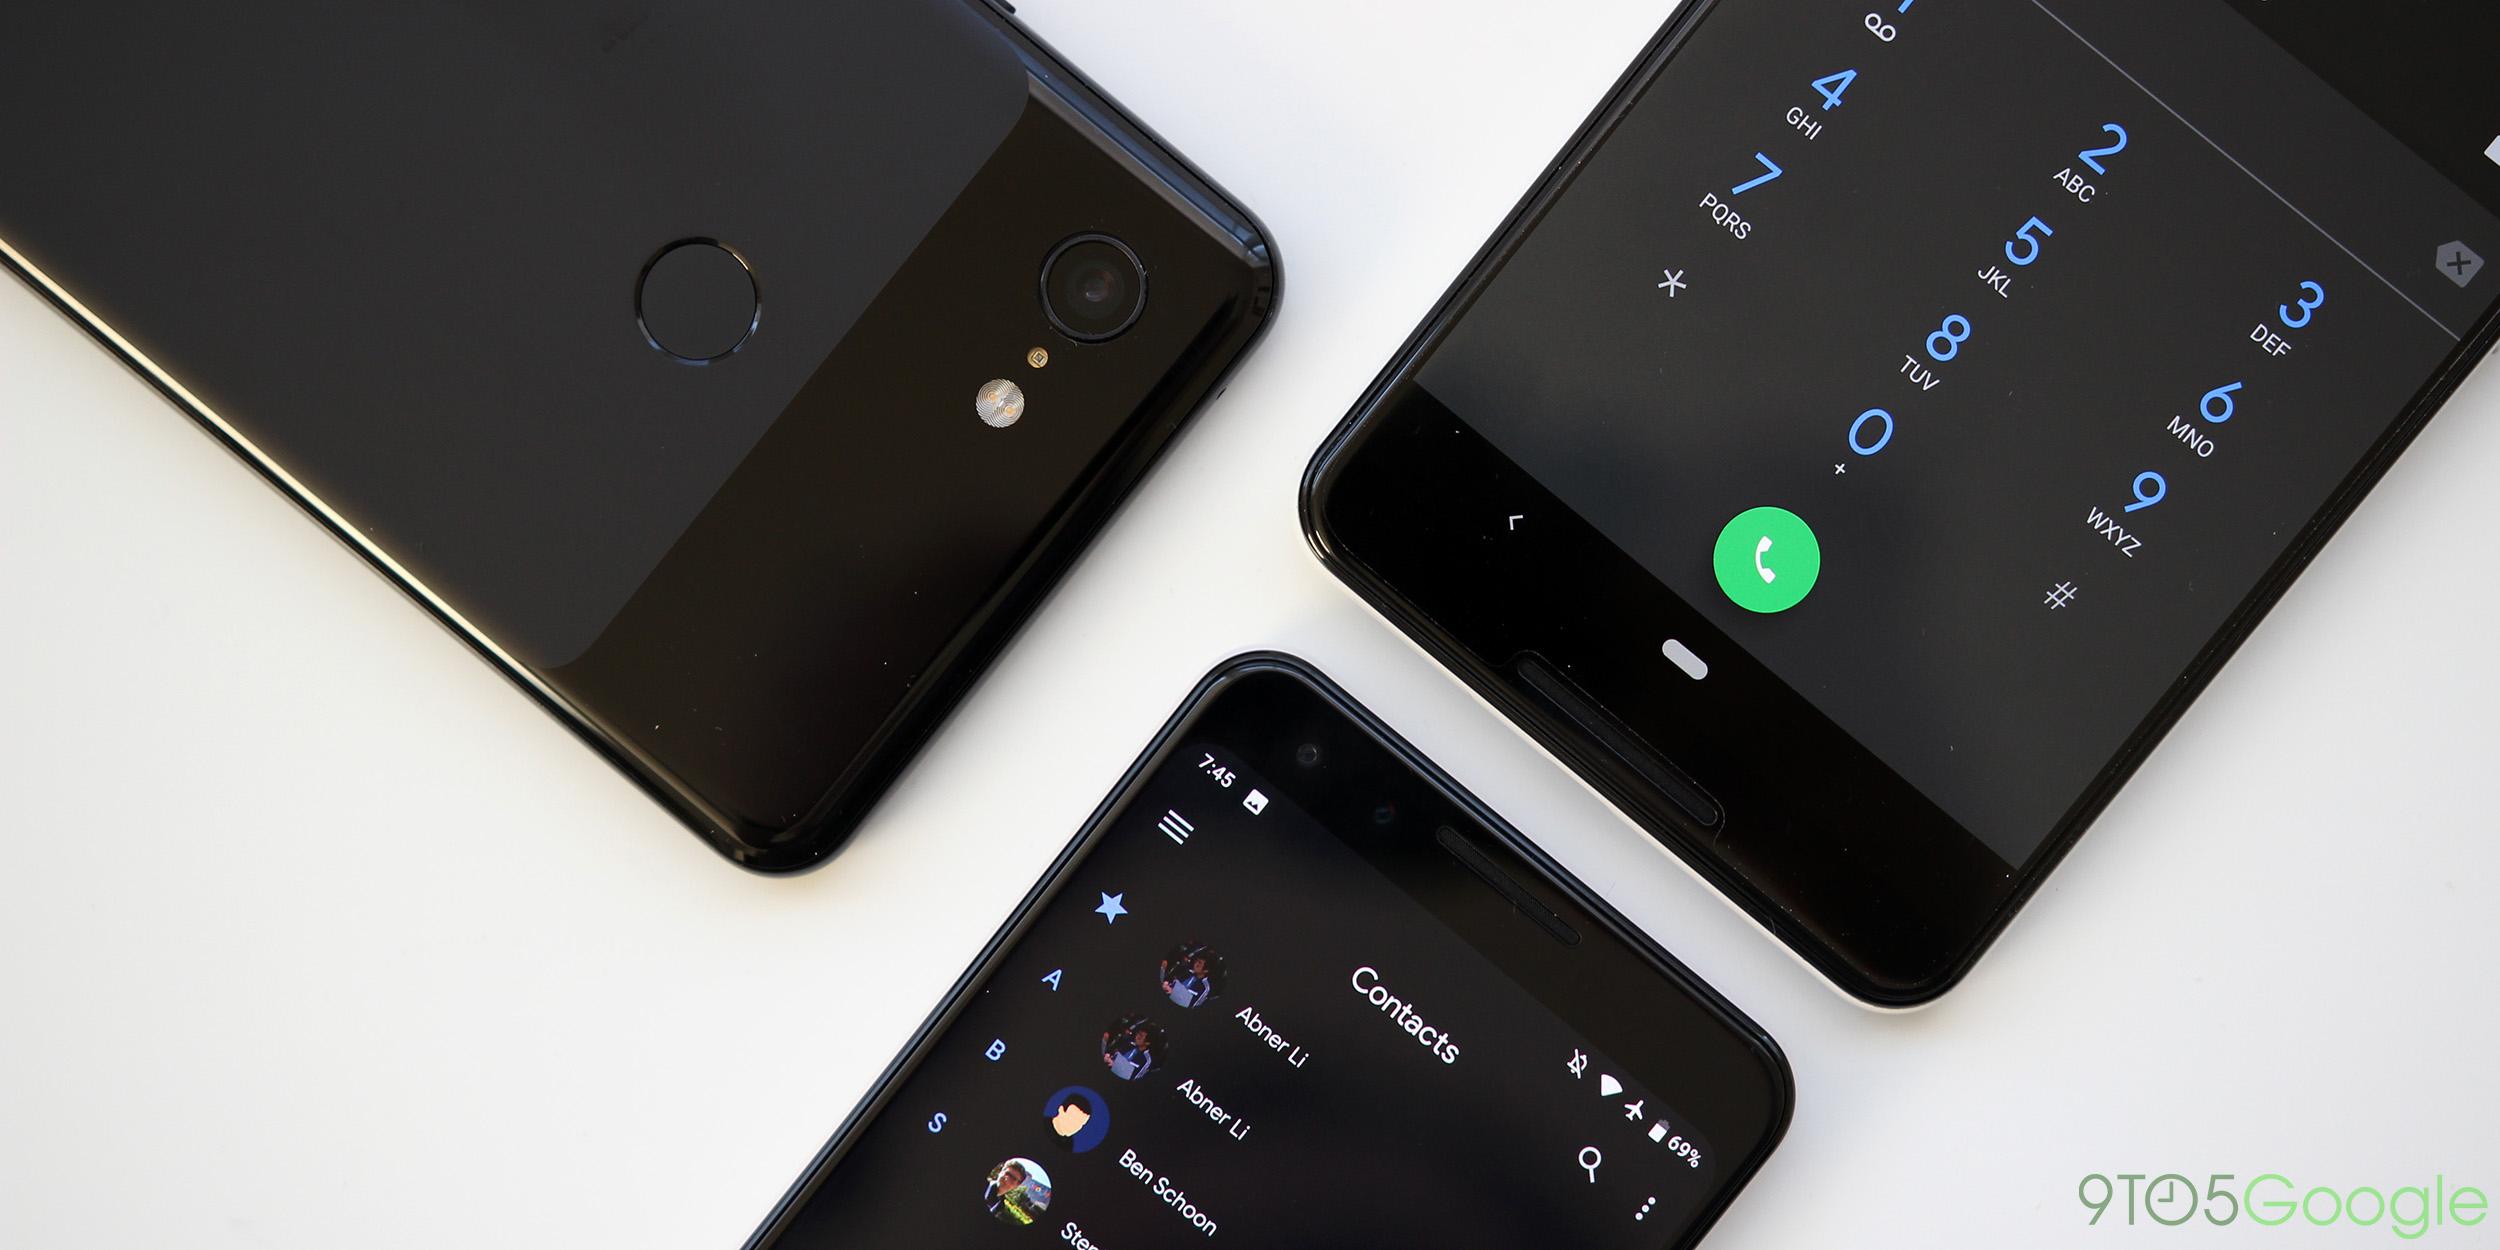 Top Stories: Android Q leak, Note 8 Pie, Pixel 3 Lite